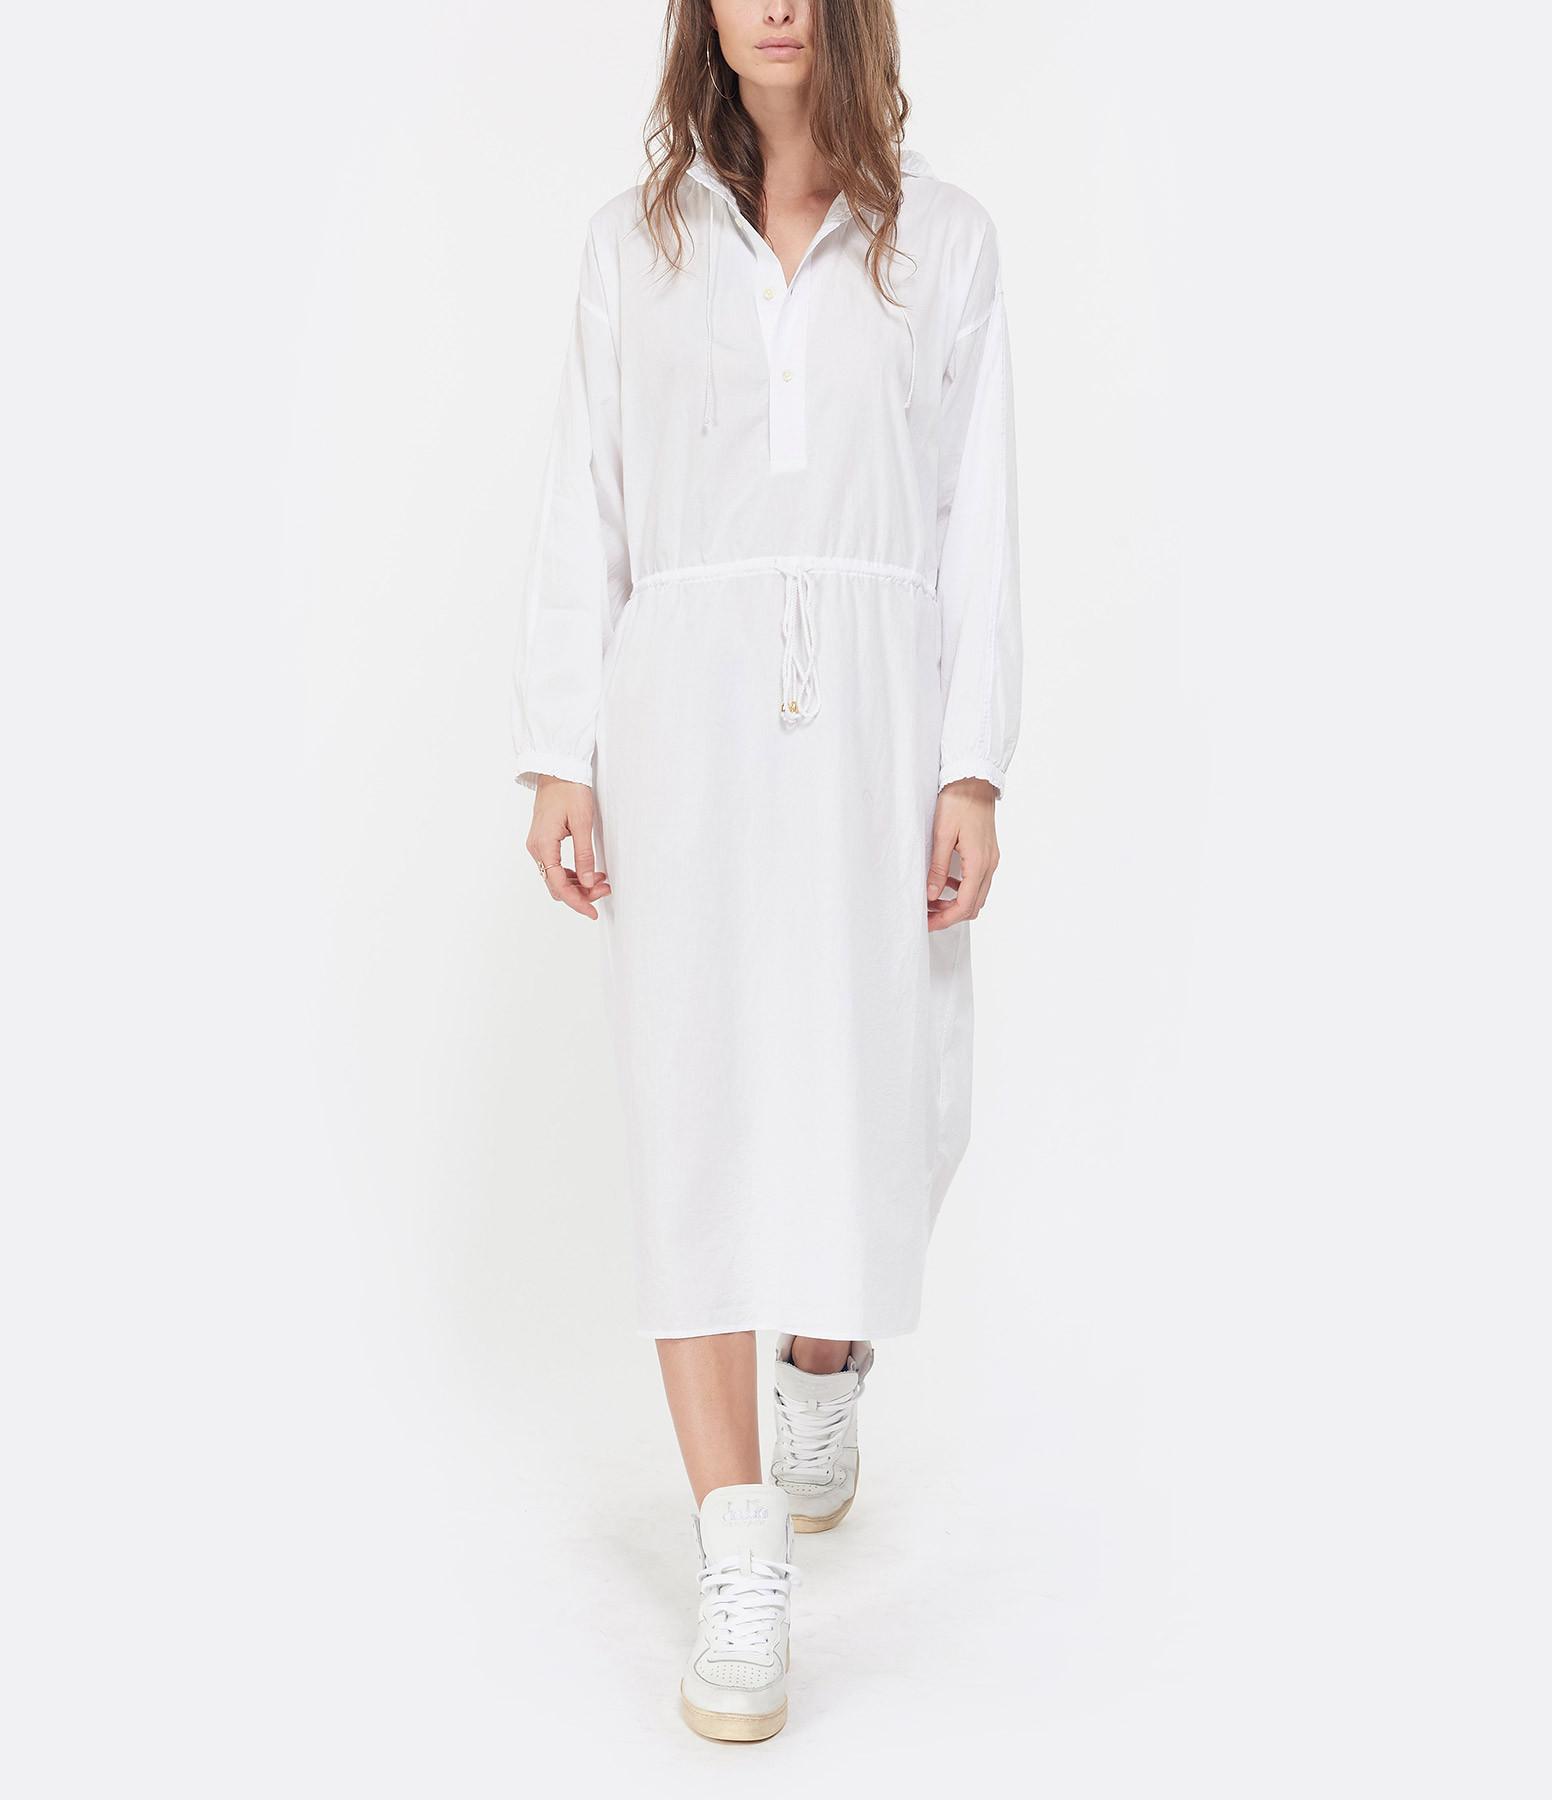 LAURENCE BRAS - Robe Ballade Coton Blanc